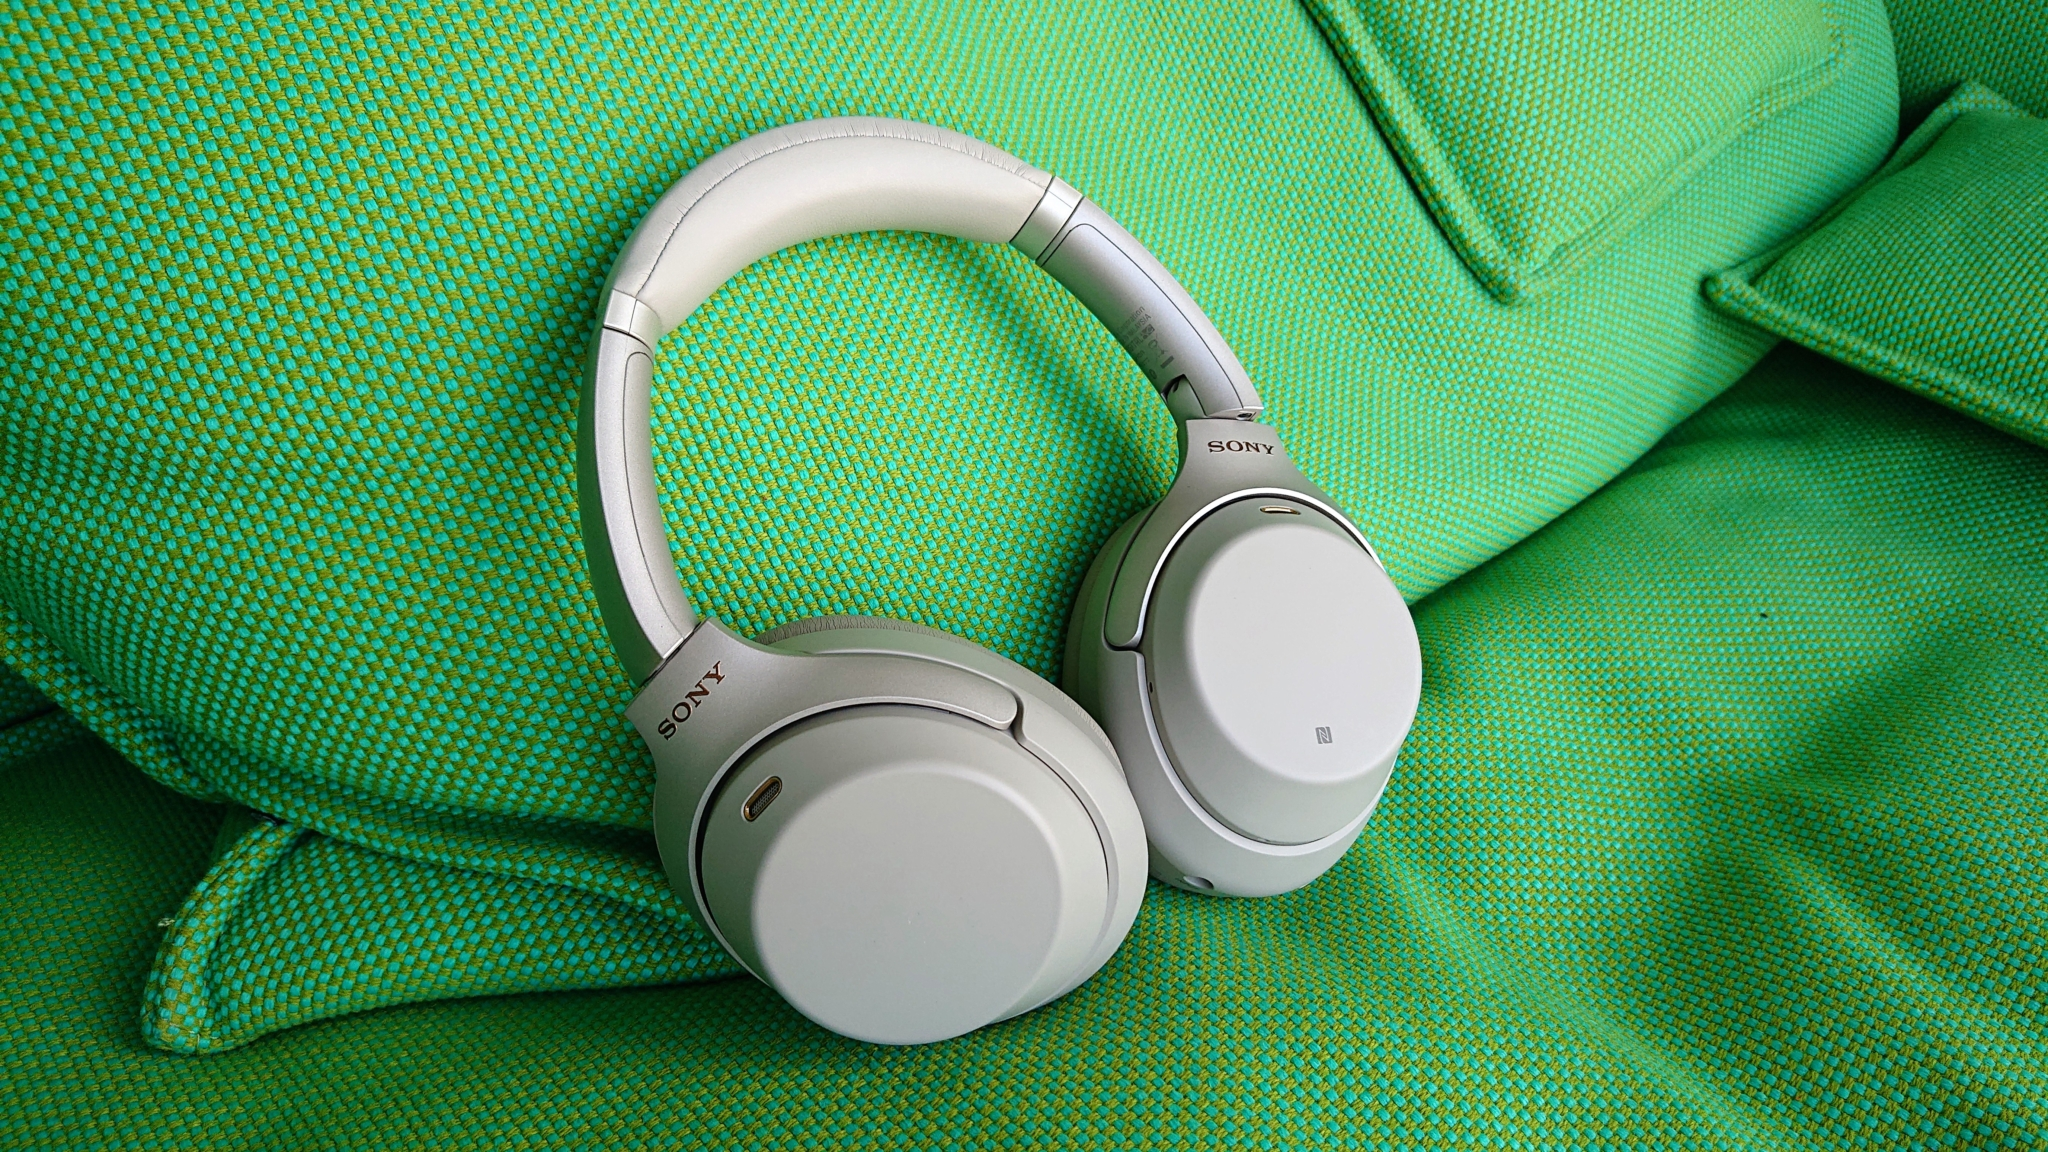 Sluchátka Sony WH-1000XM3 – utlumte nejen své kolegy [recenze]